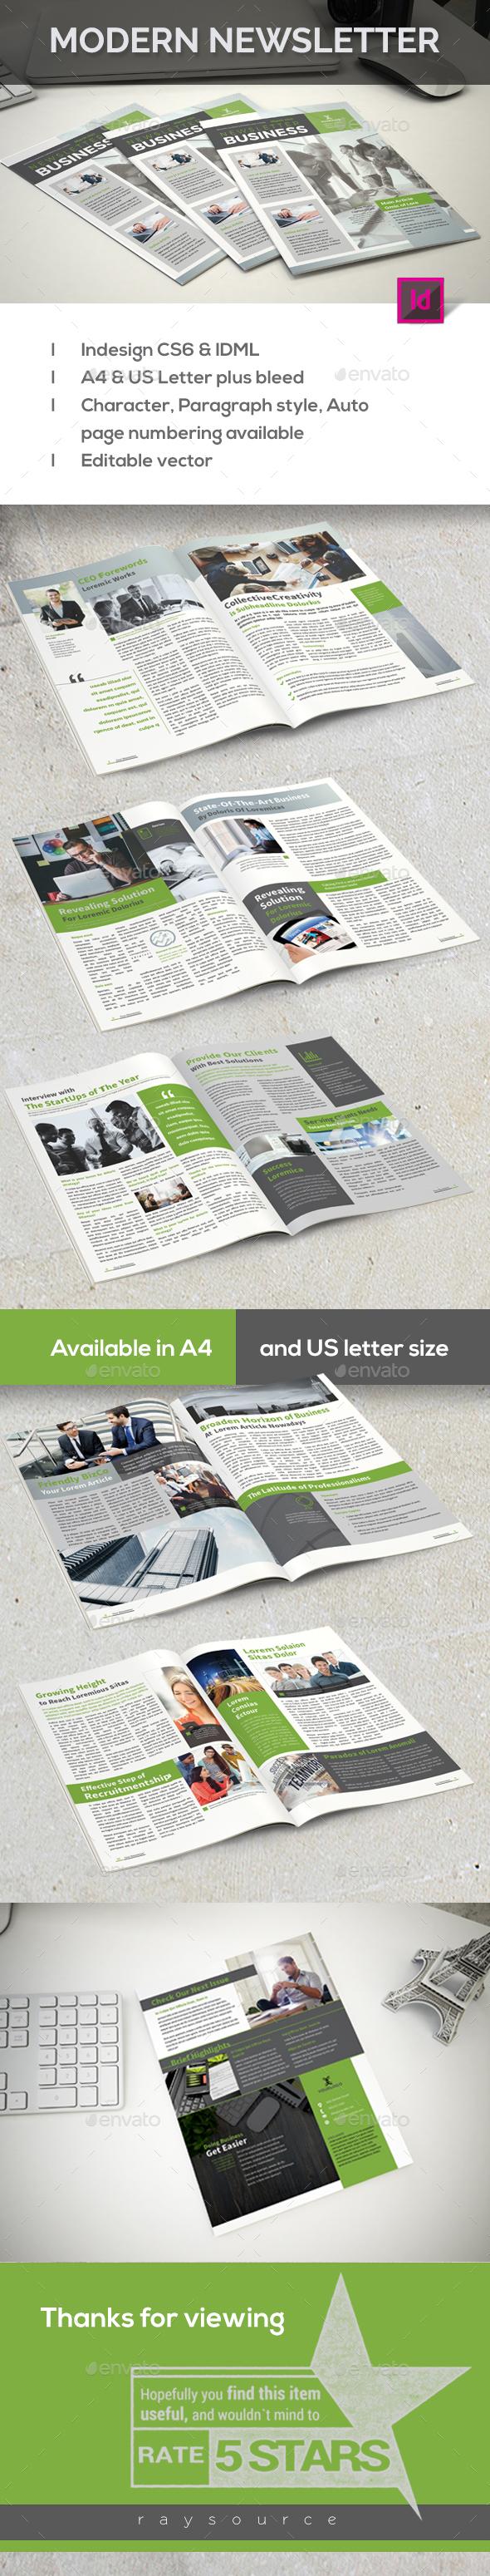 Modern Newsletter - Newsletters Print Templates